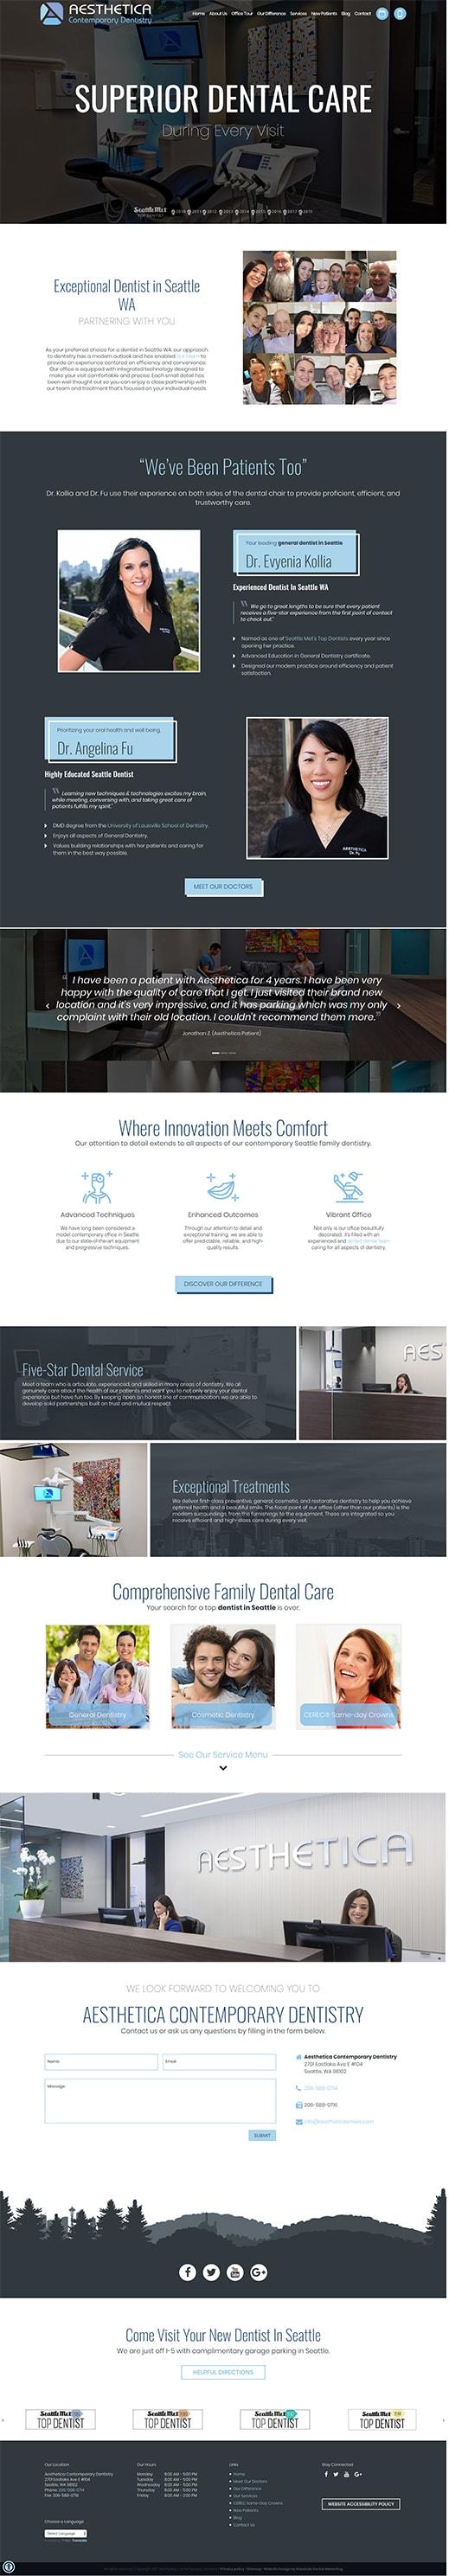 Aesthetic Contemporary Dentistry screenshot of their new responsive dental website on desktop